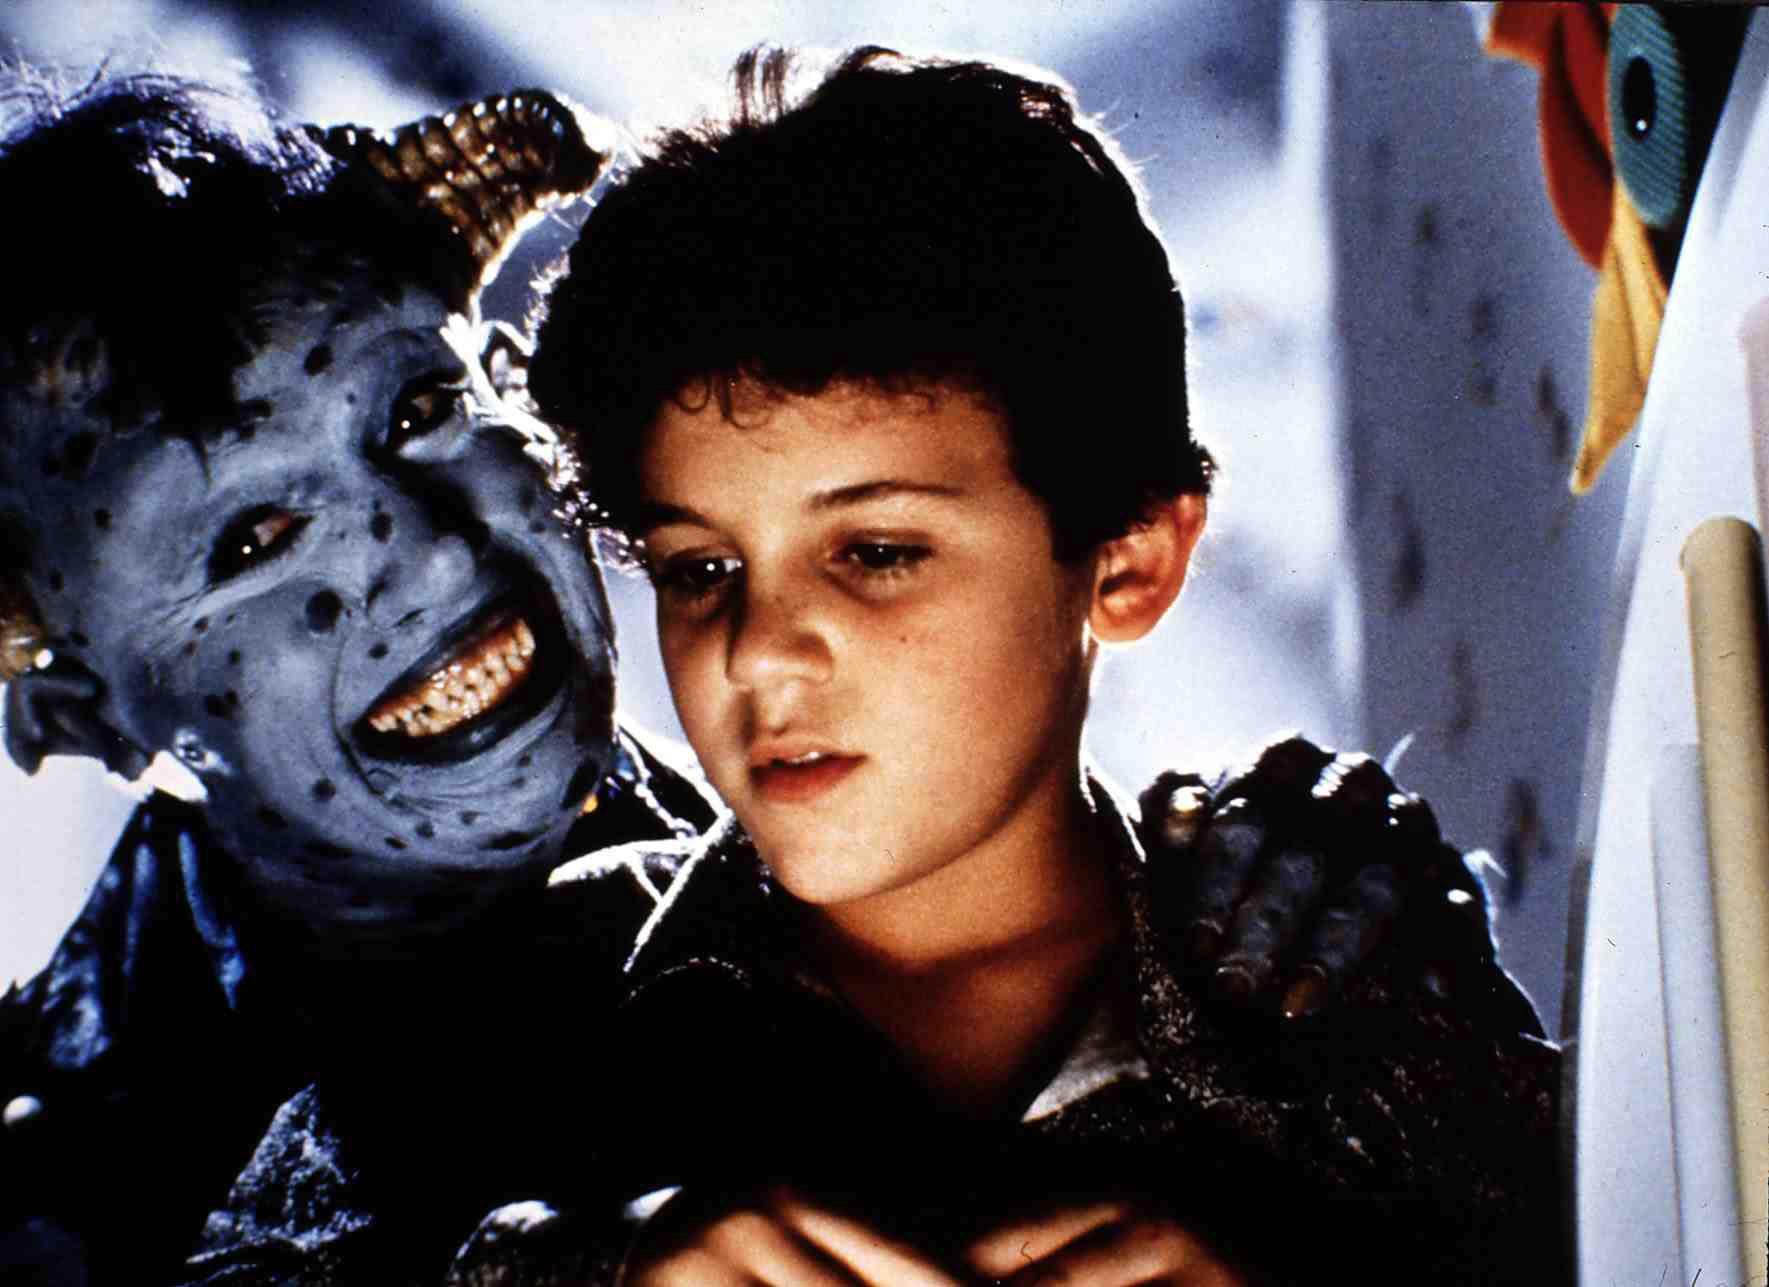 Little Monsters  (1989) Howie Mandel, Fred Savage   Maurice (Howie Mandel,l) freundet sich mit Brian (Fred Savage) an. Regie: